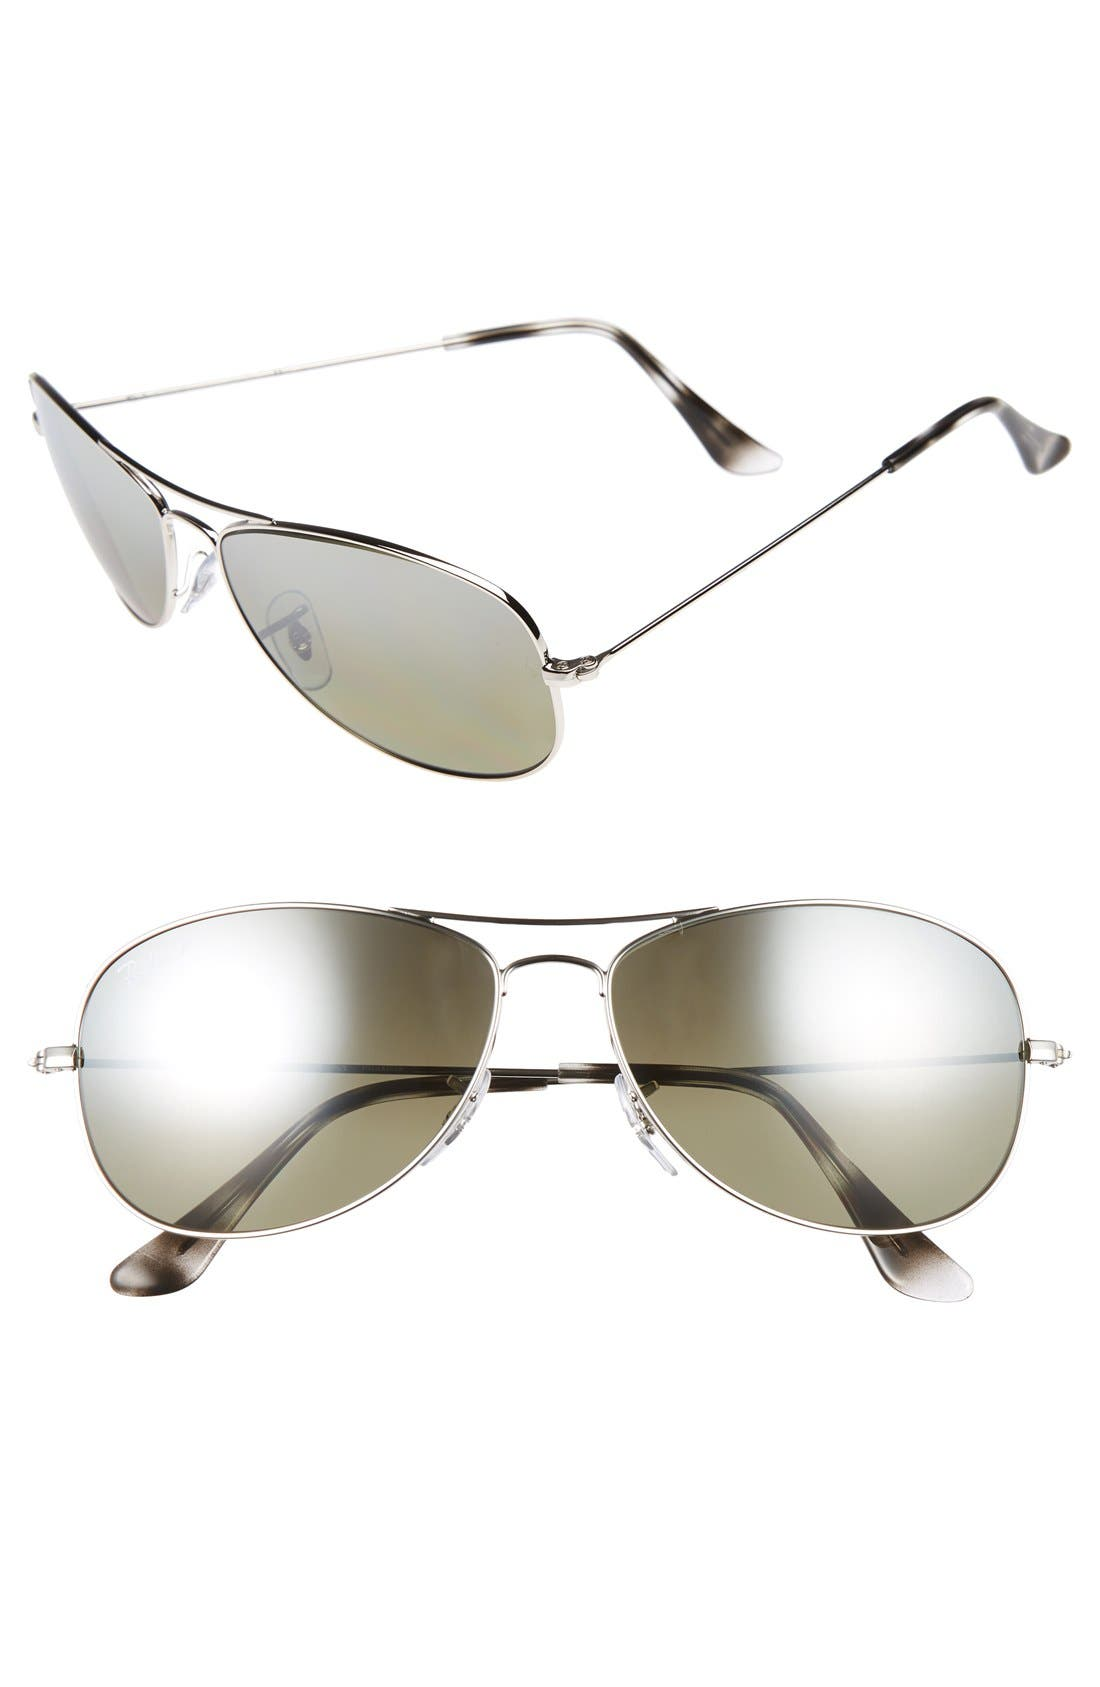 Tech 59mm Polarized Sunglasses,                             Main thumbnail 1, color,                             020